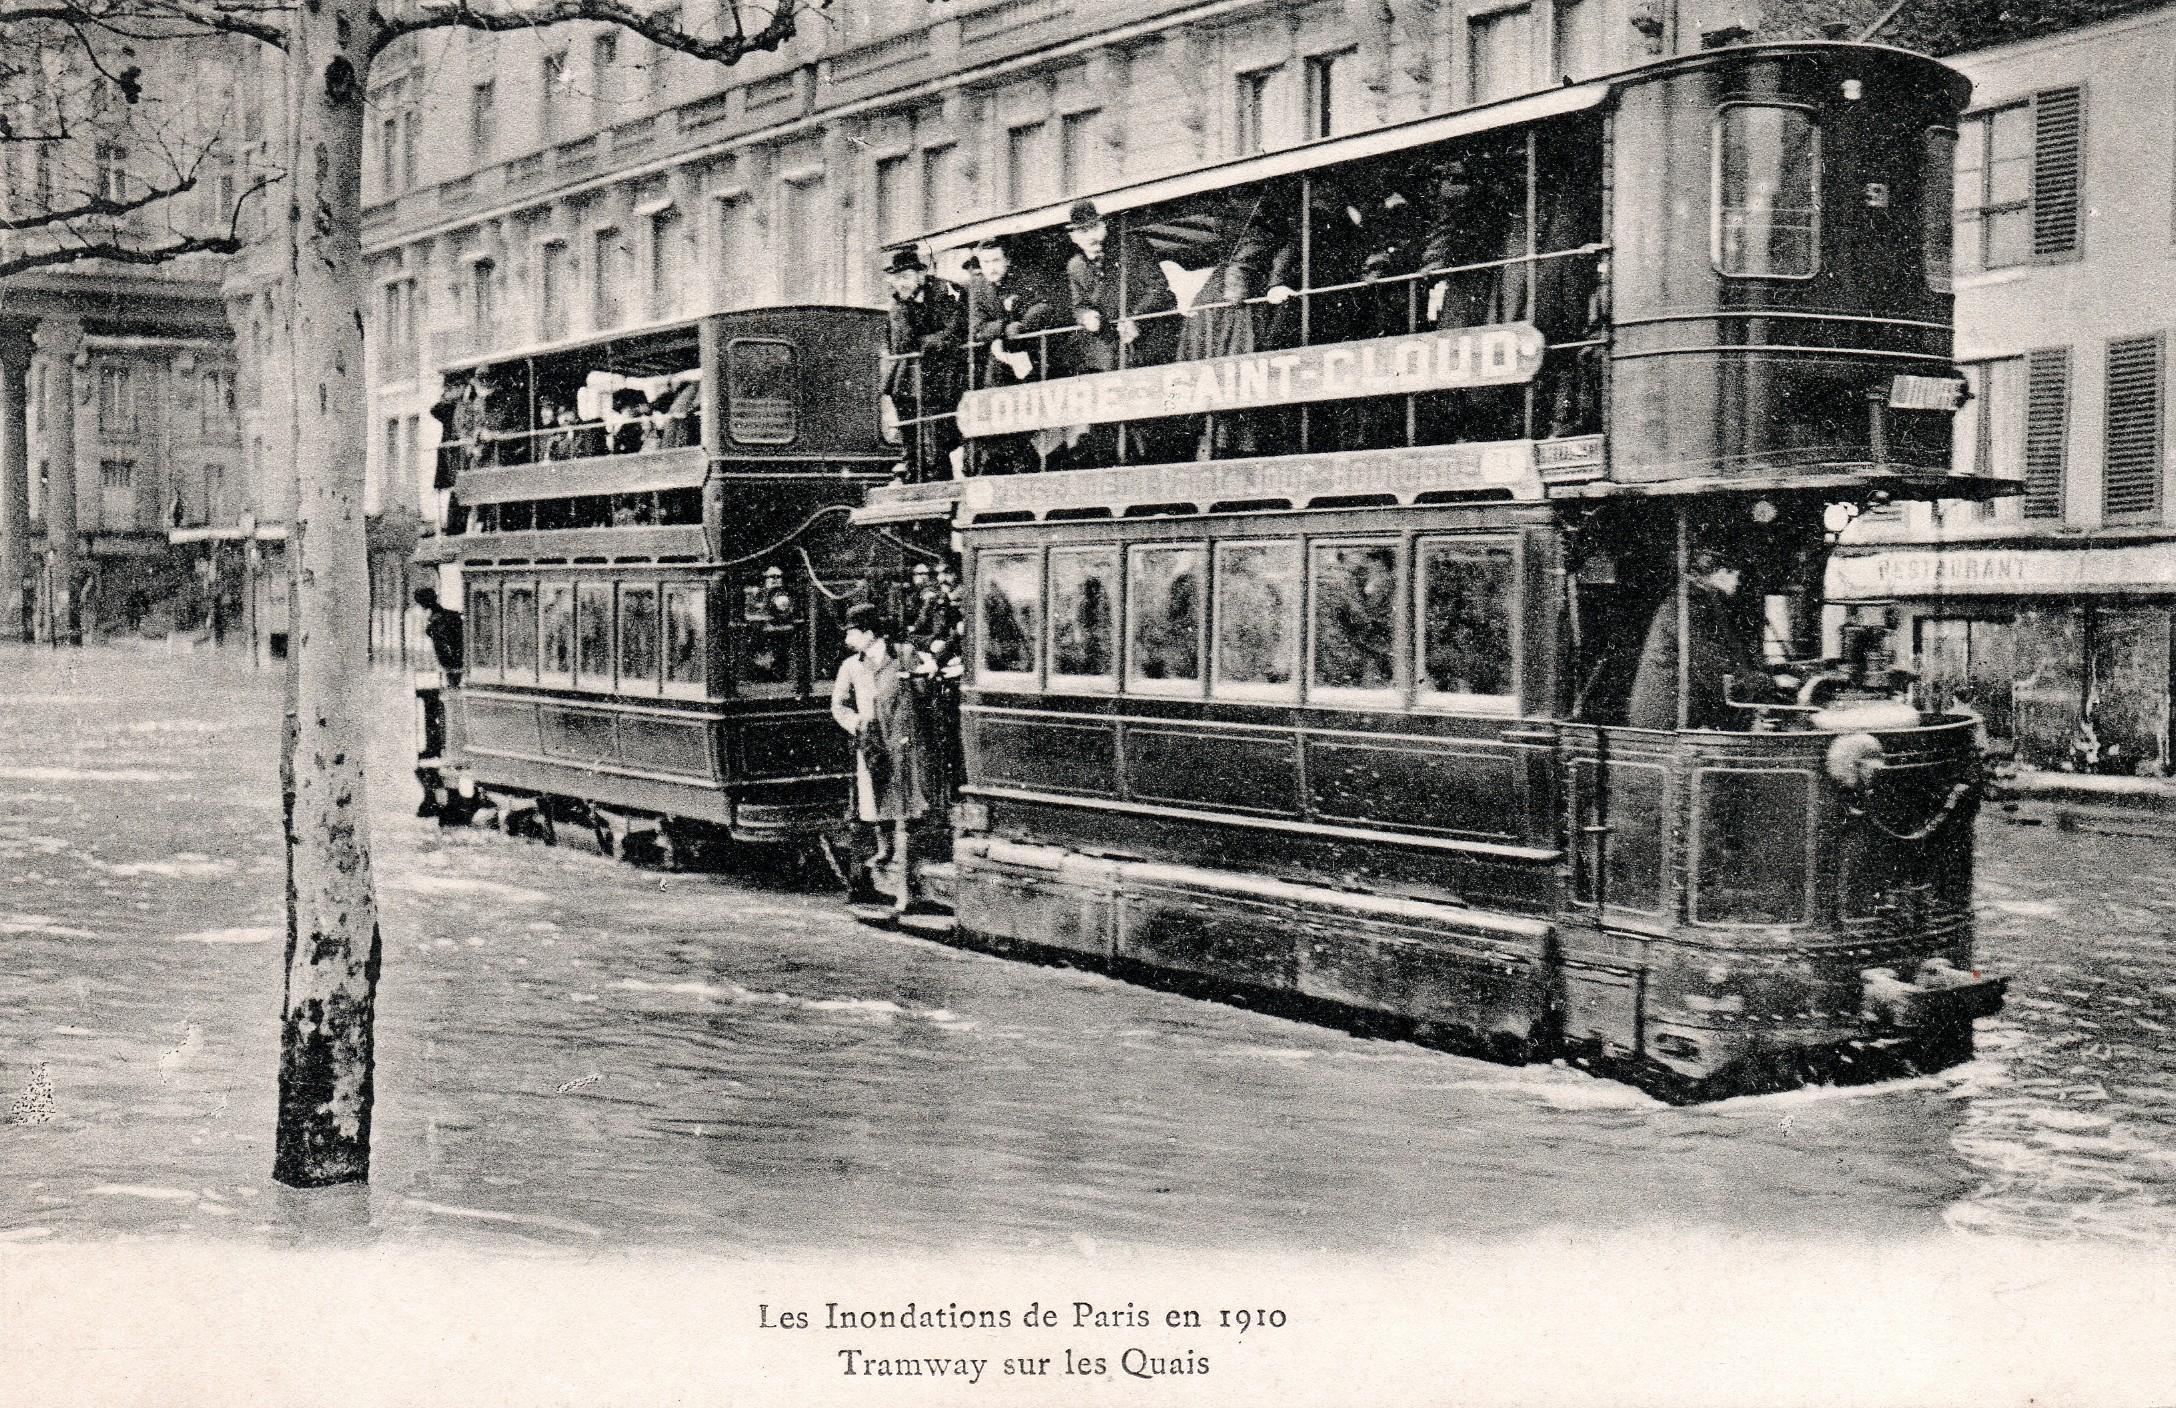 1910, grande crue à Paris, les services publics